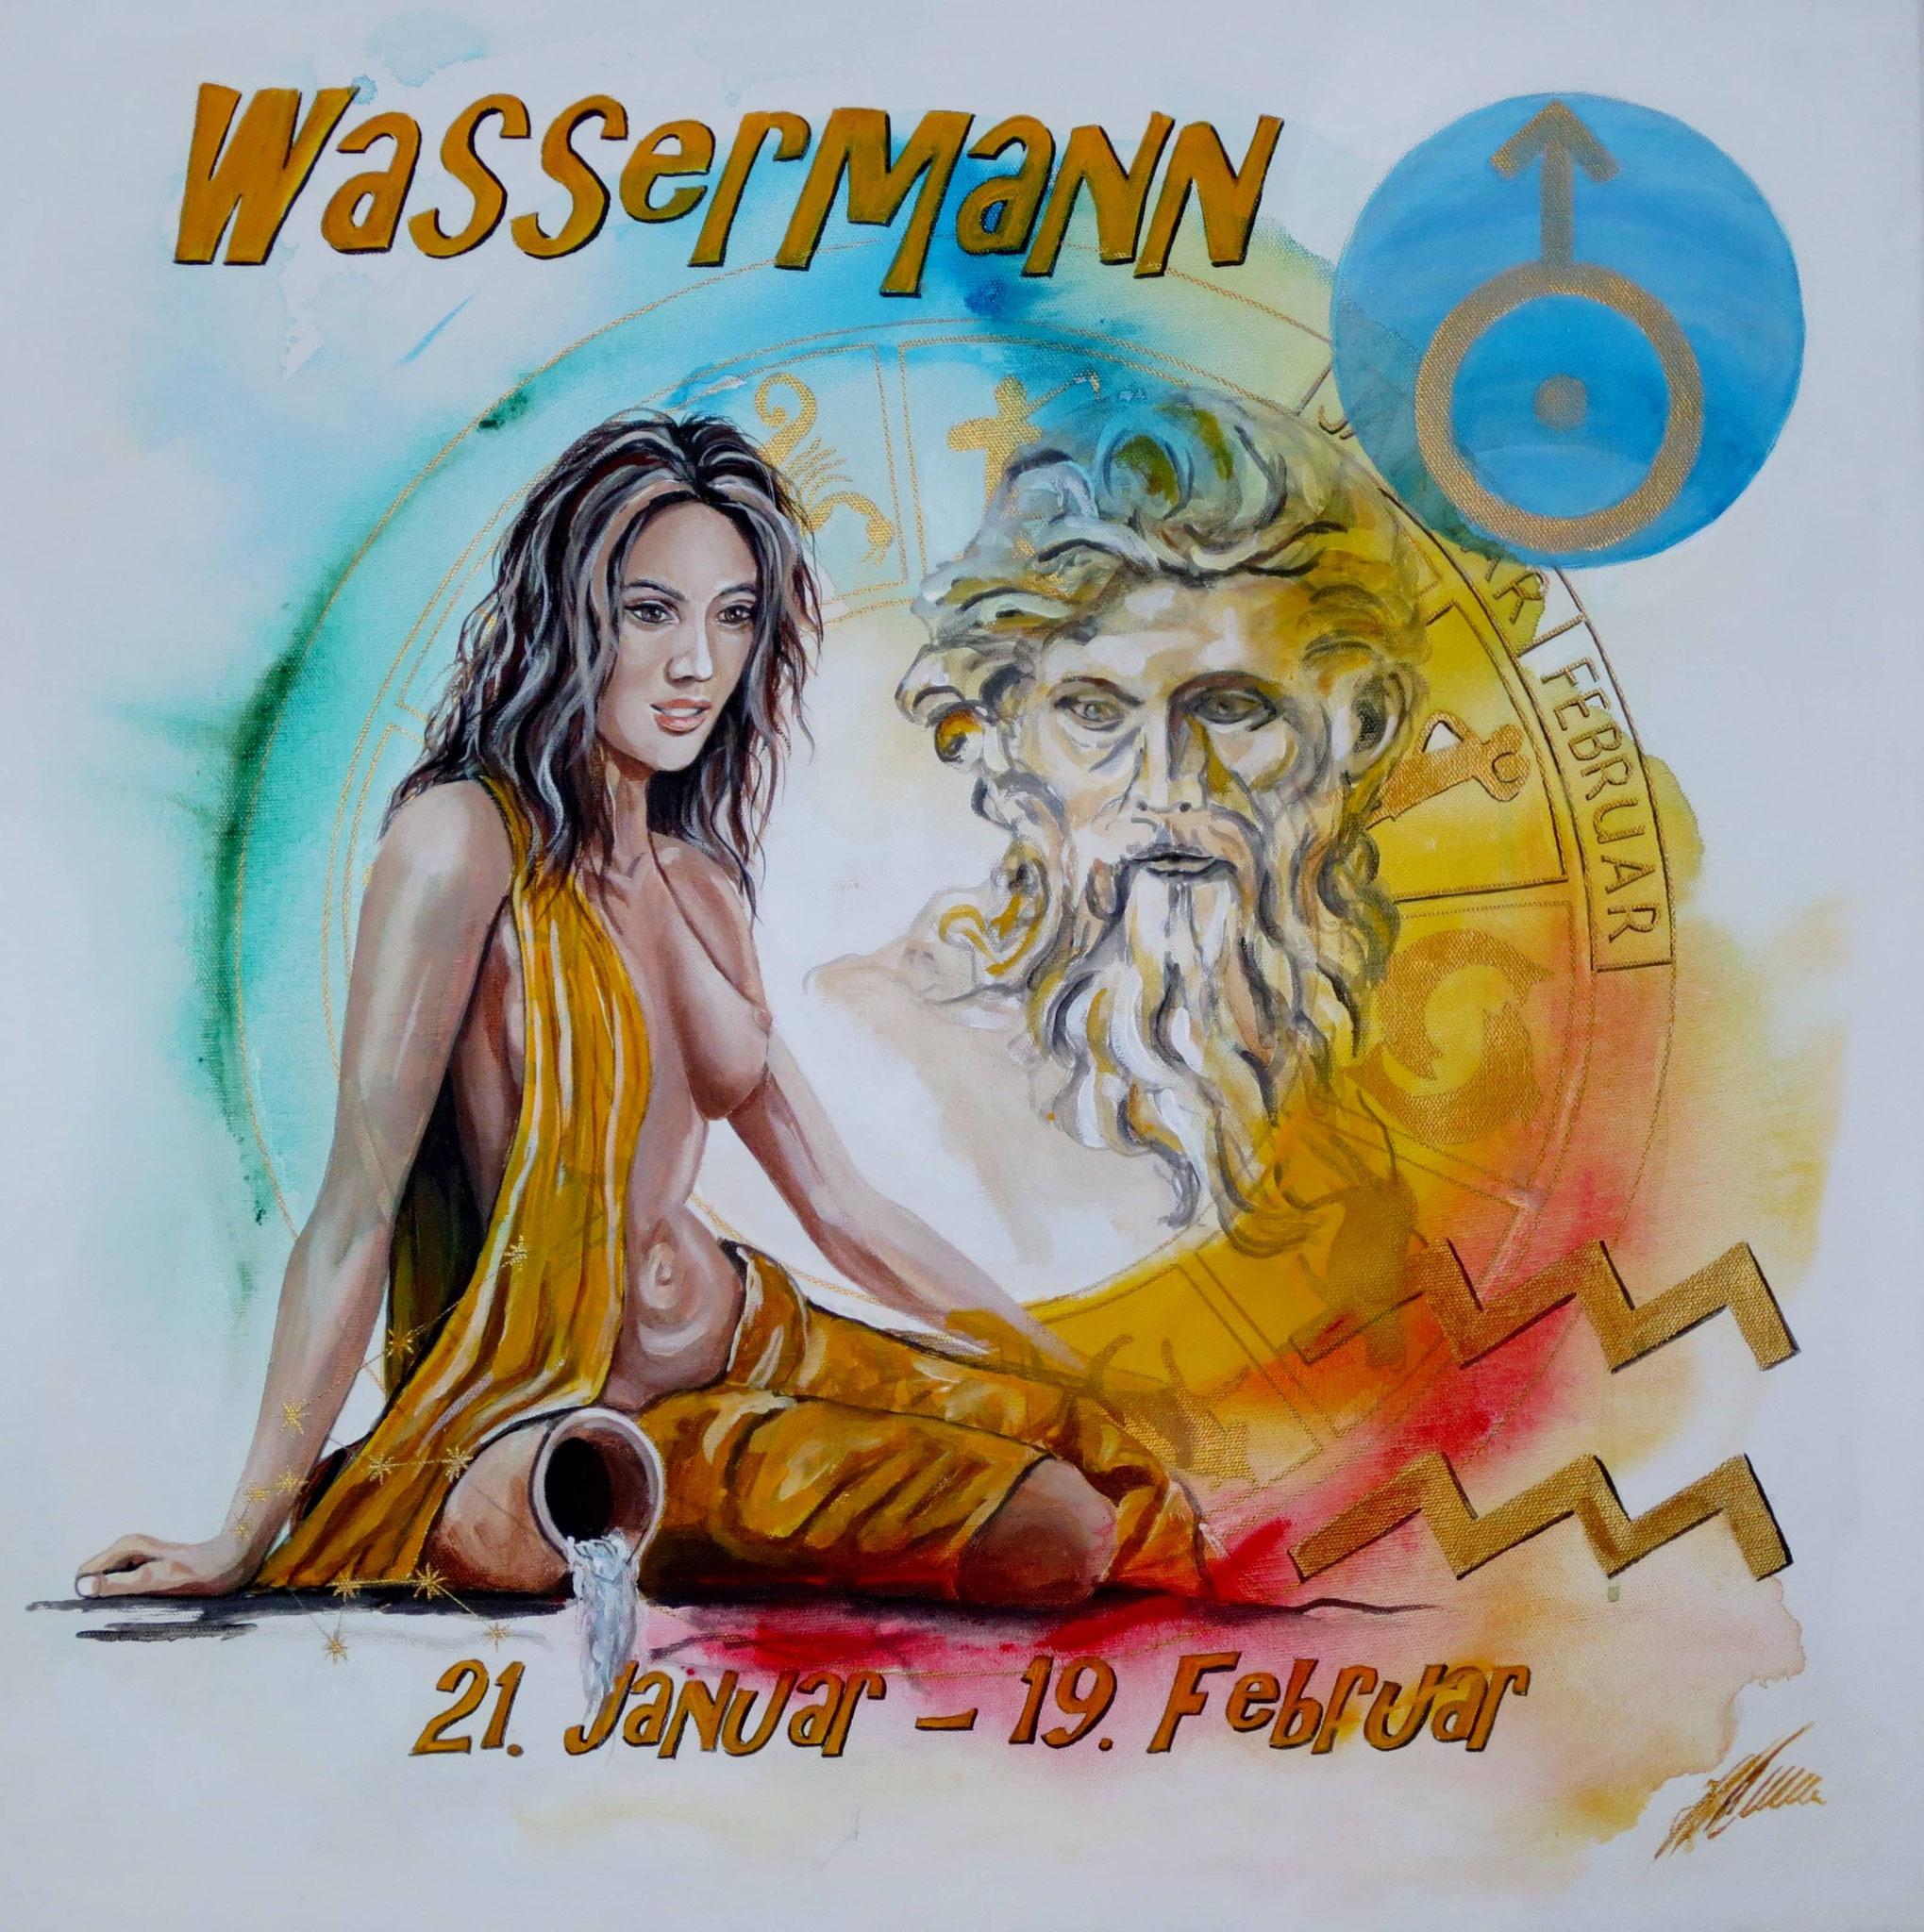 "Fr. 480.00 ""Wassermann, Serie classic"" Acryl auf Leinwand mit Rahmen 60 x 60 cm."